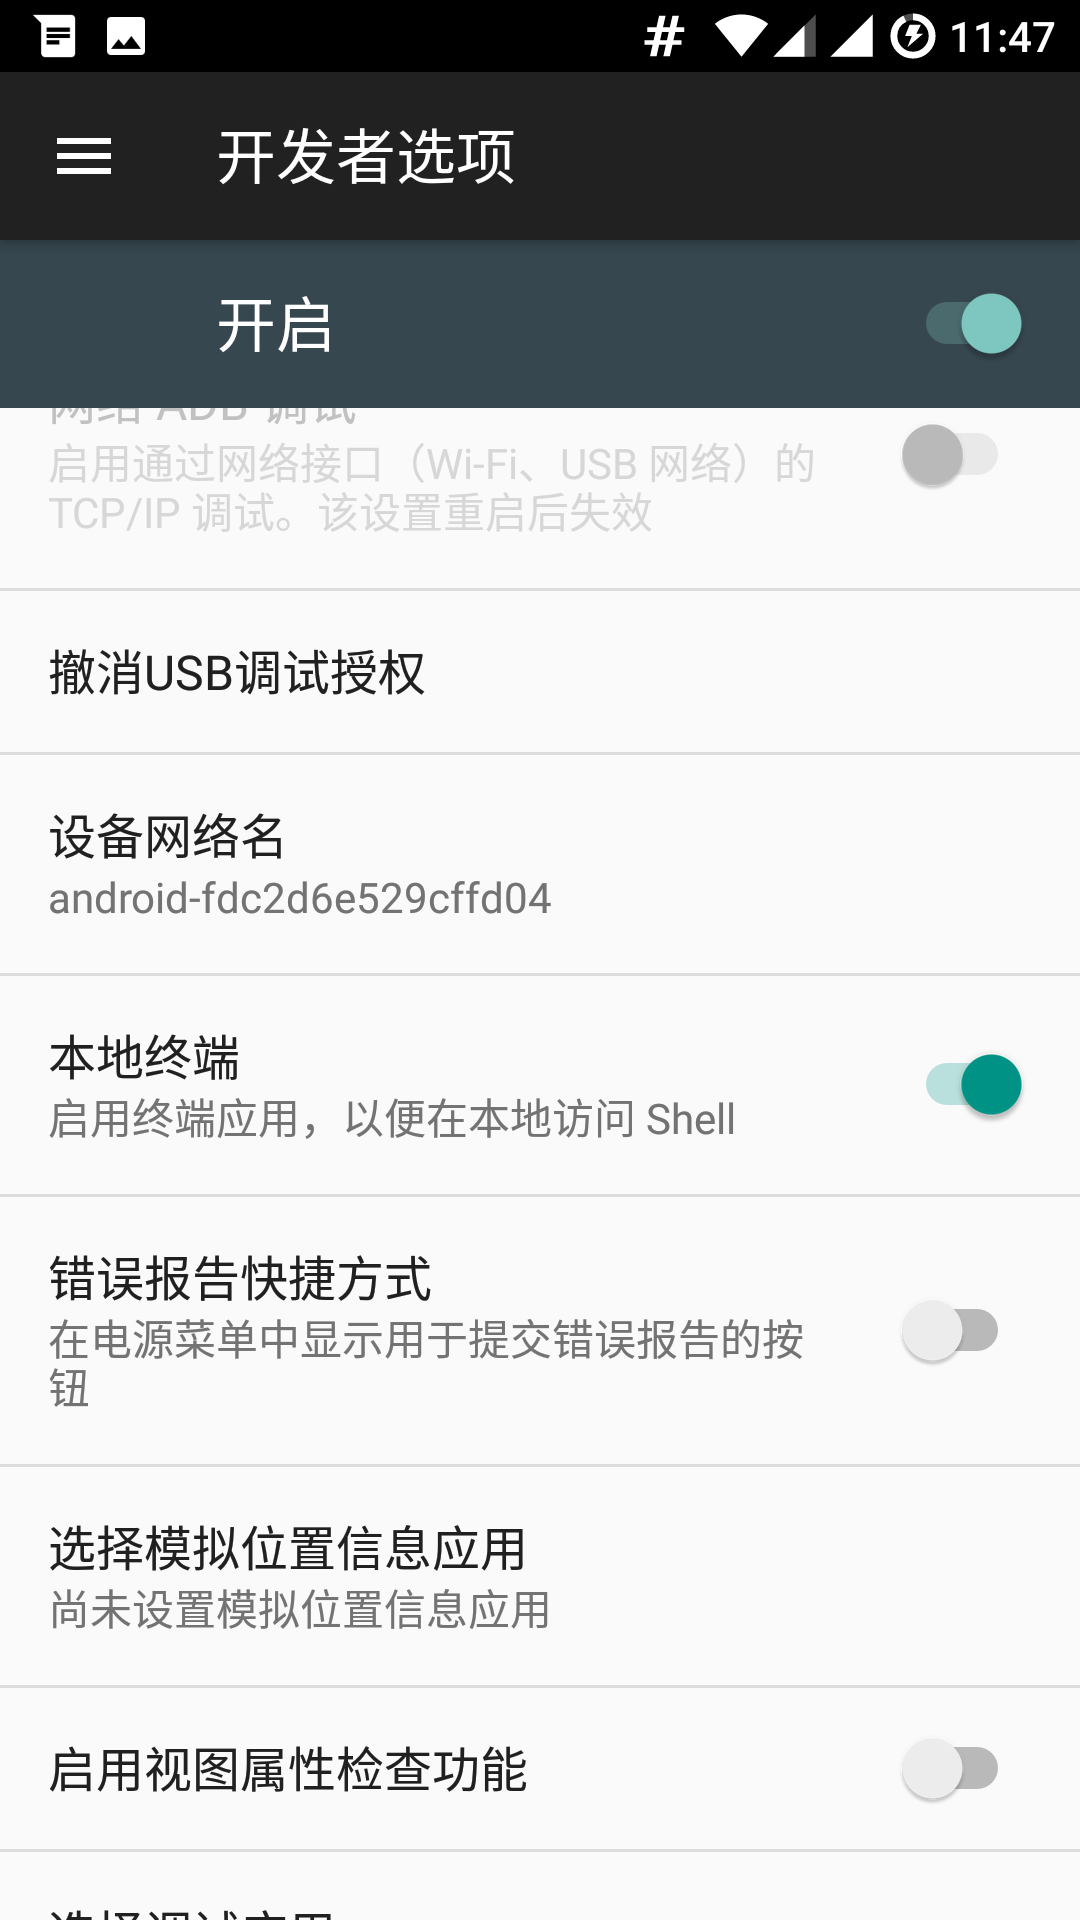 Screenshot_20180307-114737.png